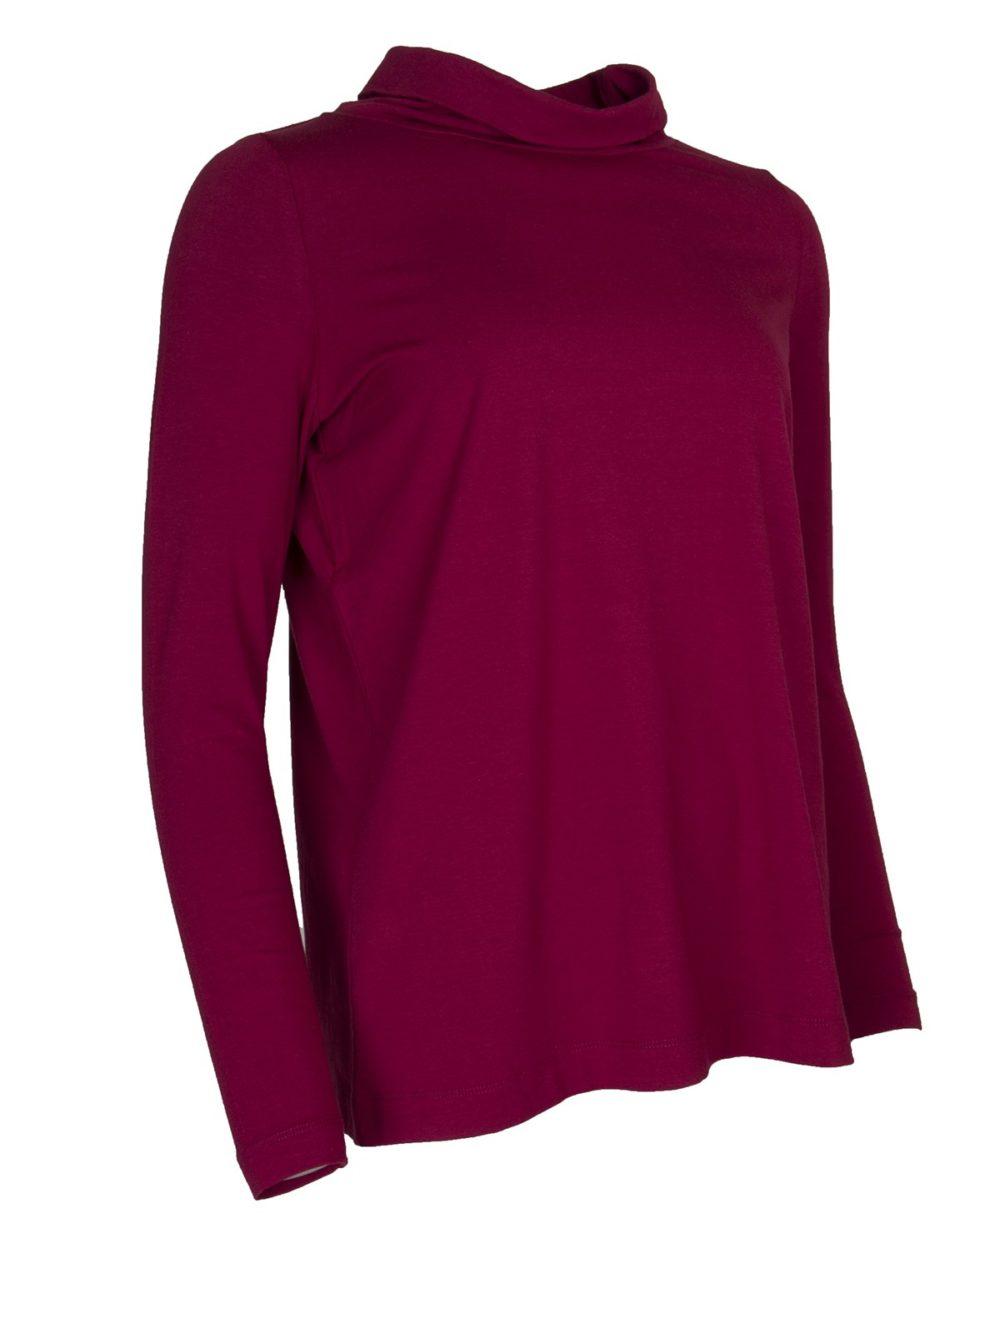 Bendicte polo shirt